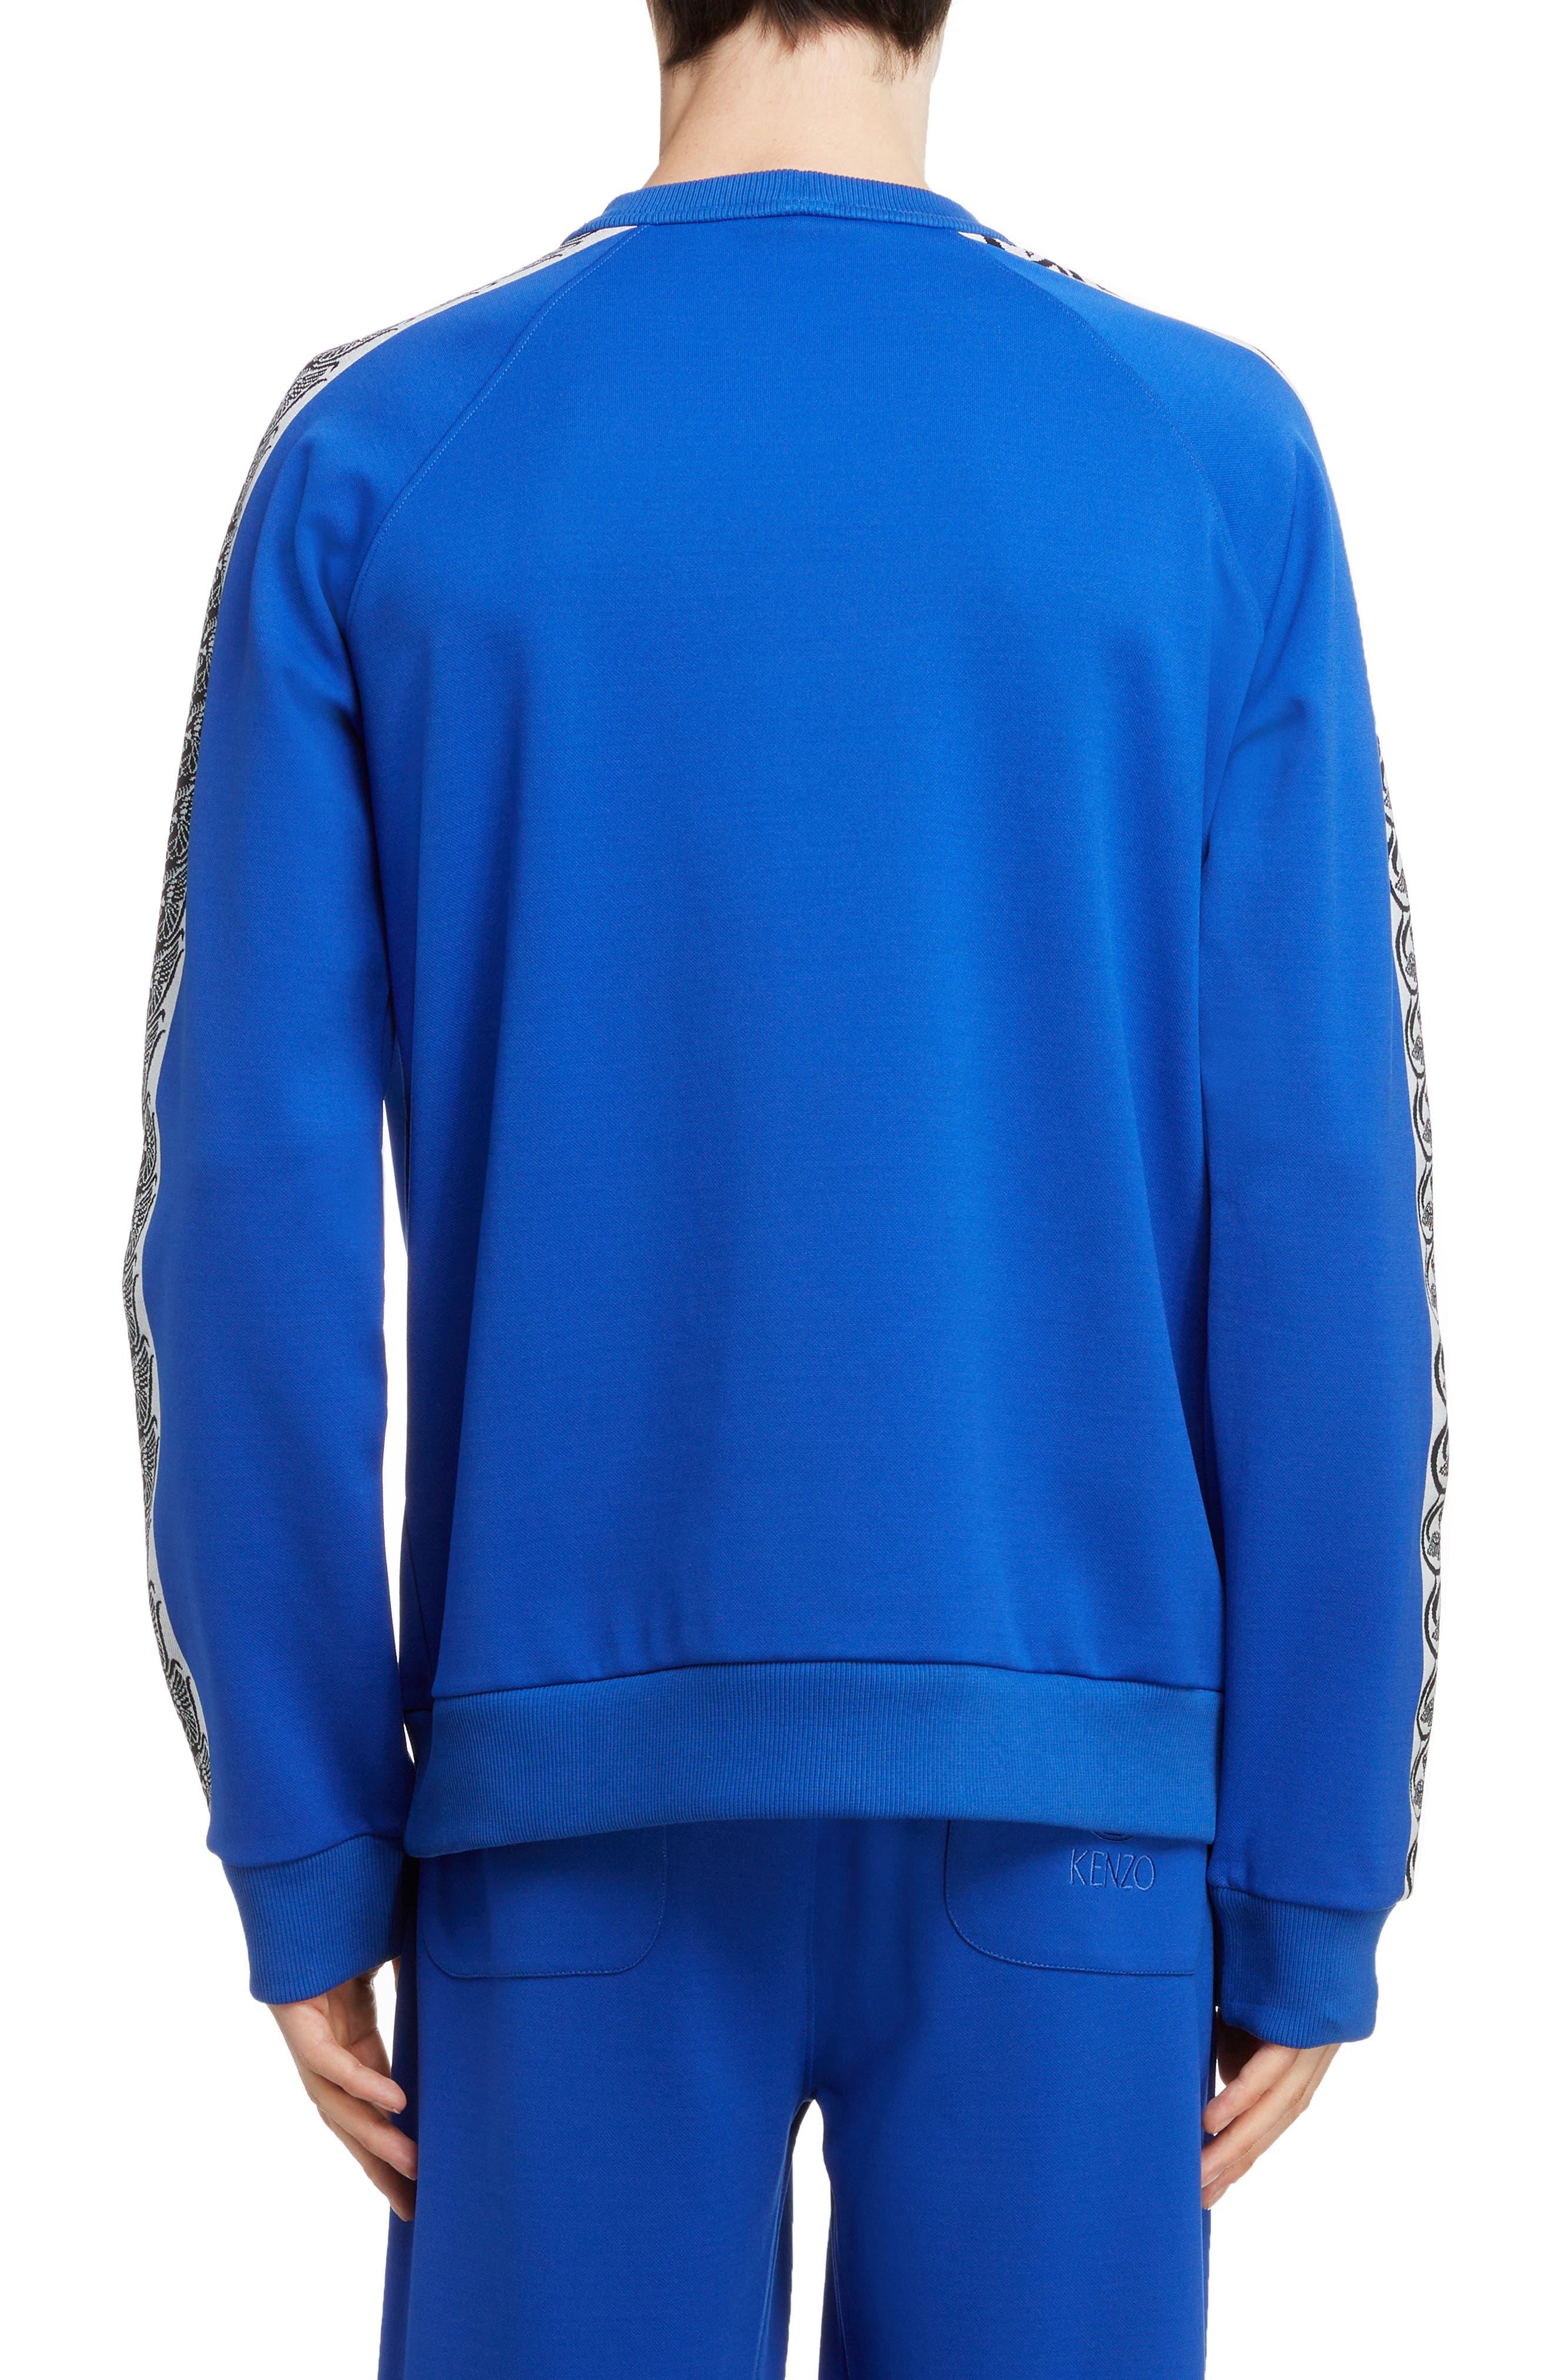 KENZO, Jacquard Raglan Sweatshirt, Alternate thumbnail 2, color, FRENCH BLUE